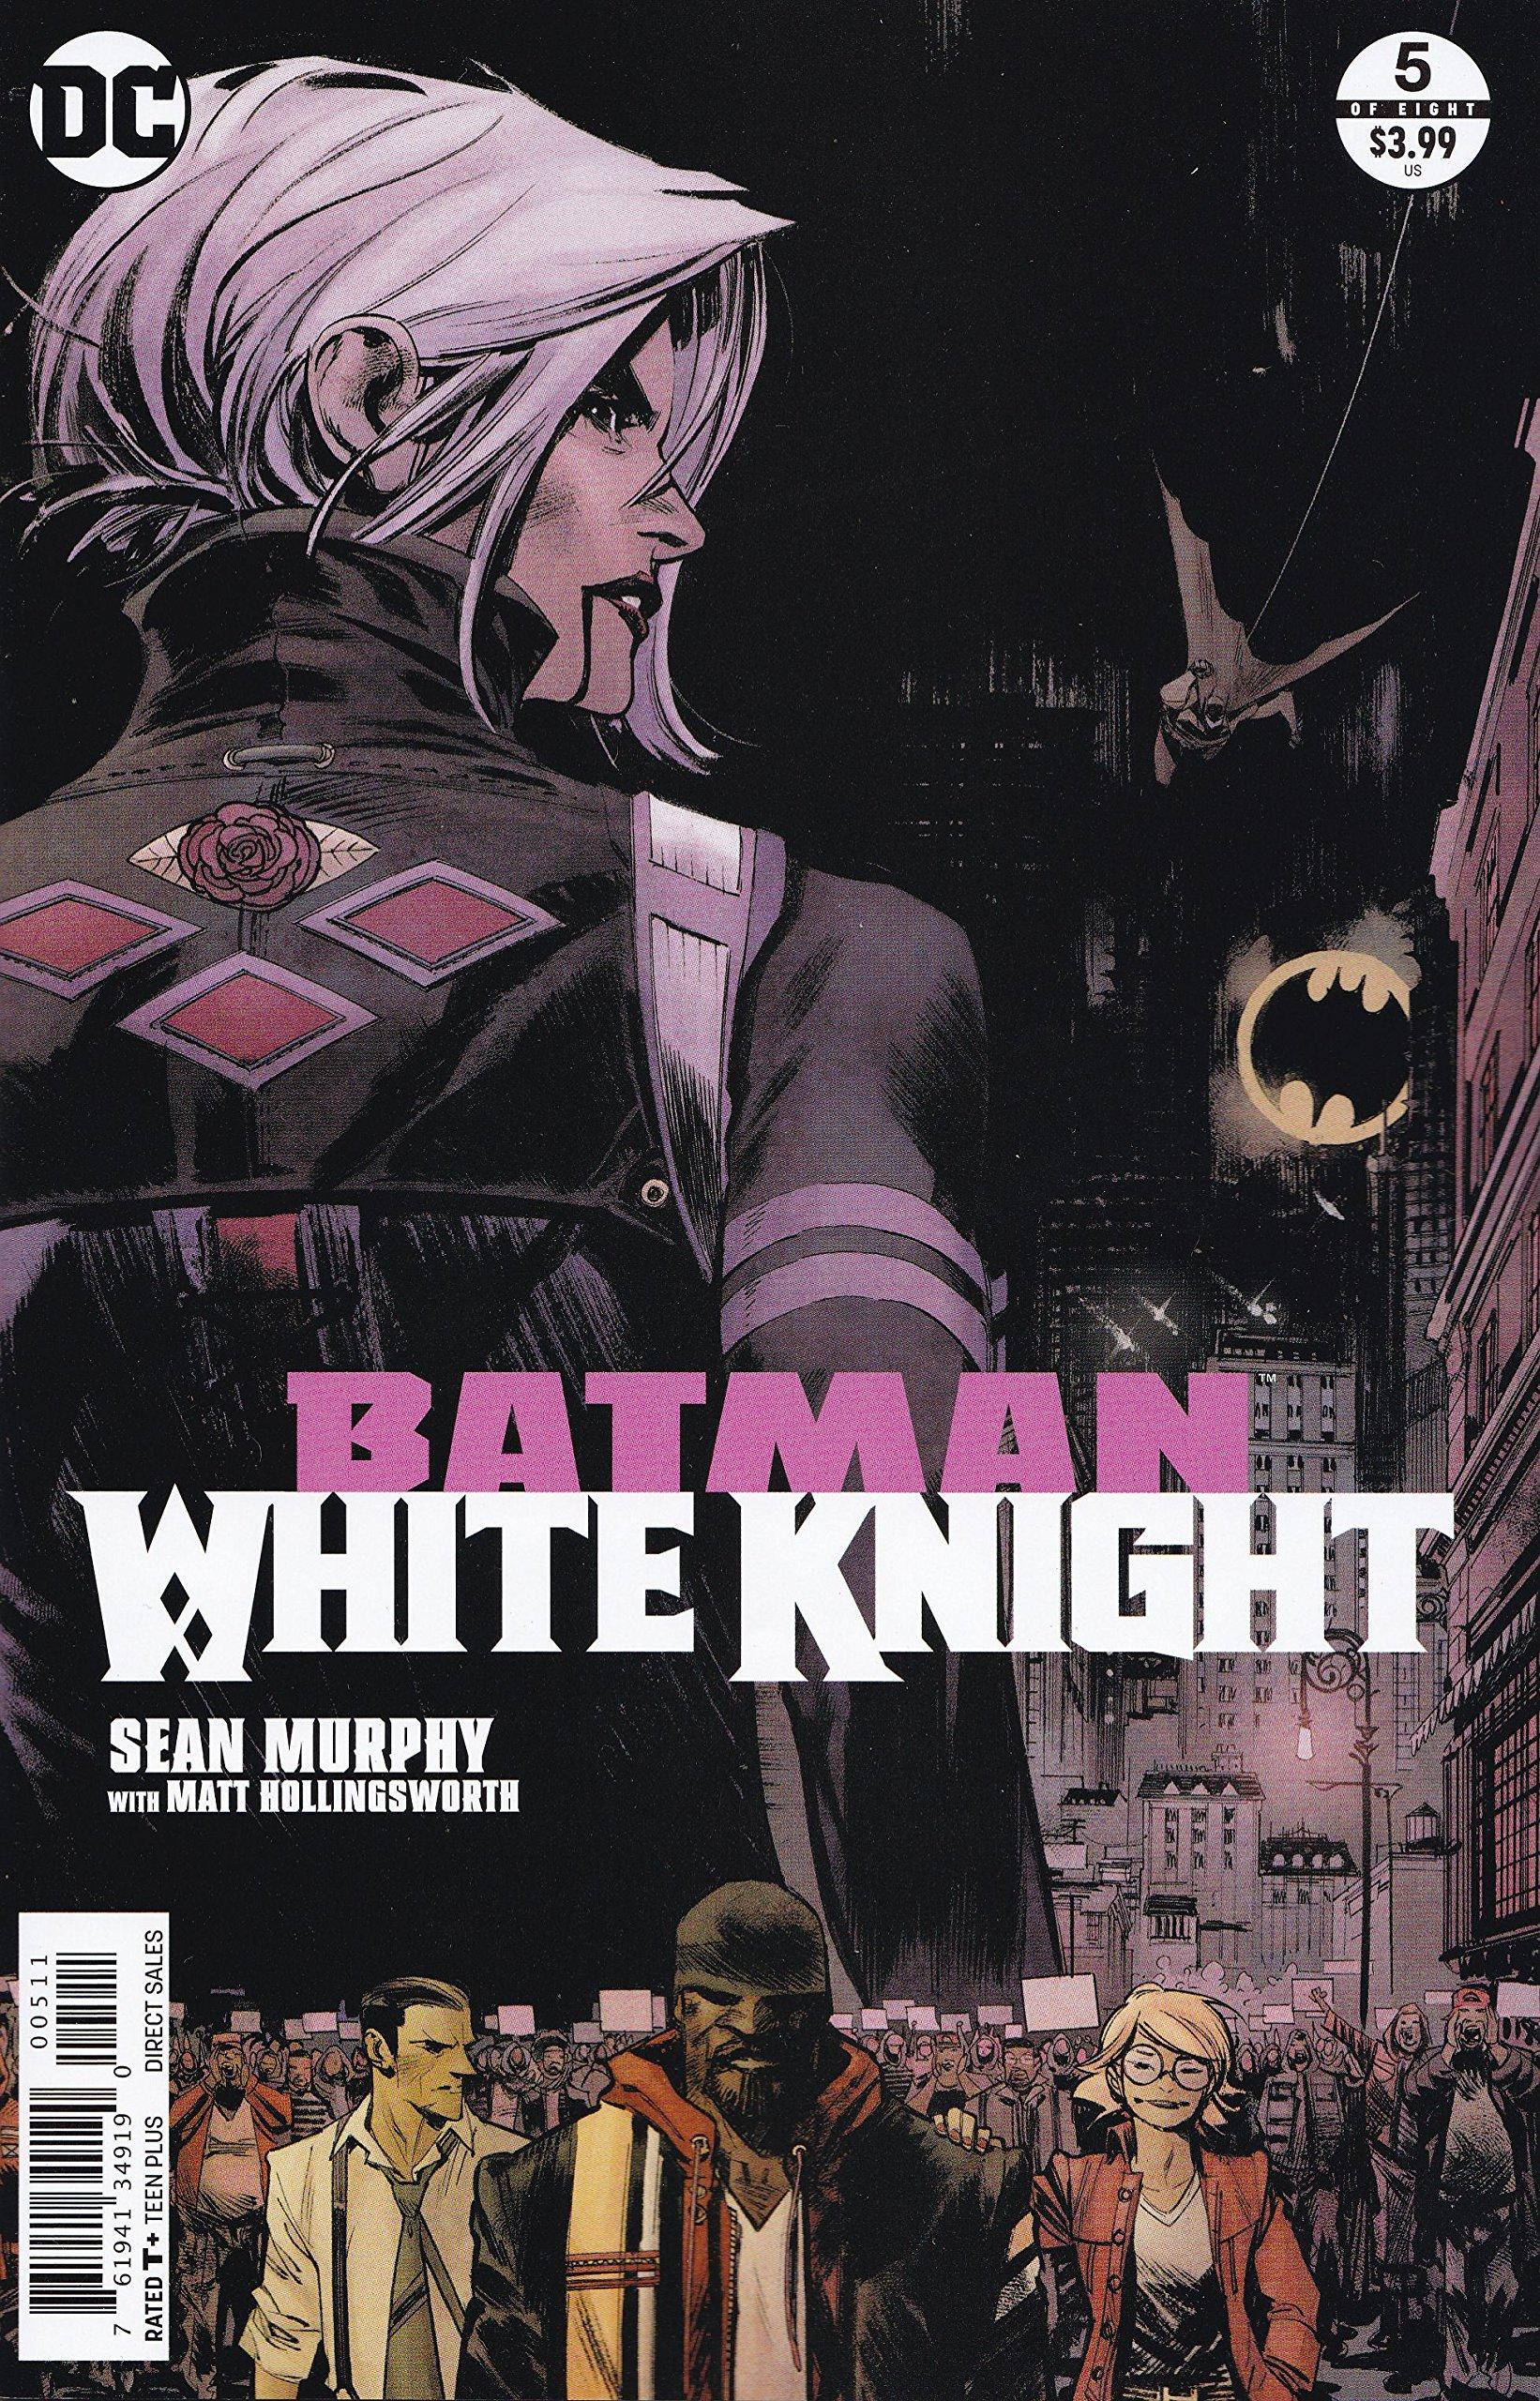 Read Online BATMAN WHITE KNIGHT #5 (OF 8) RELEASE DATE 2/7/2018 pdf epub